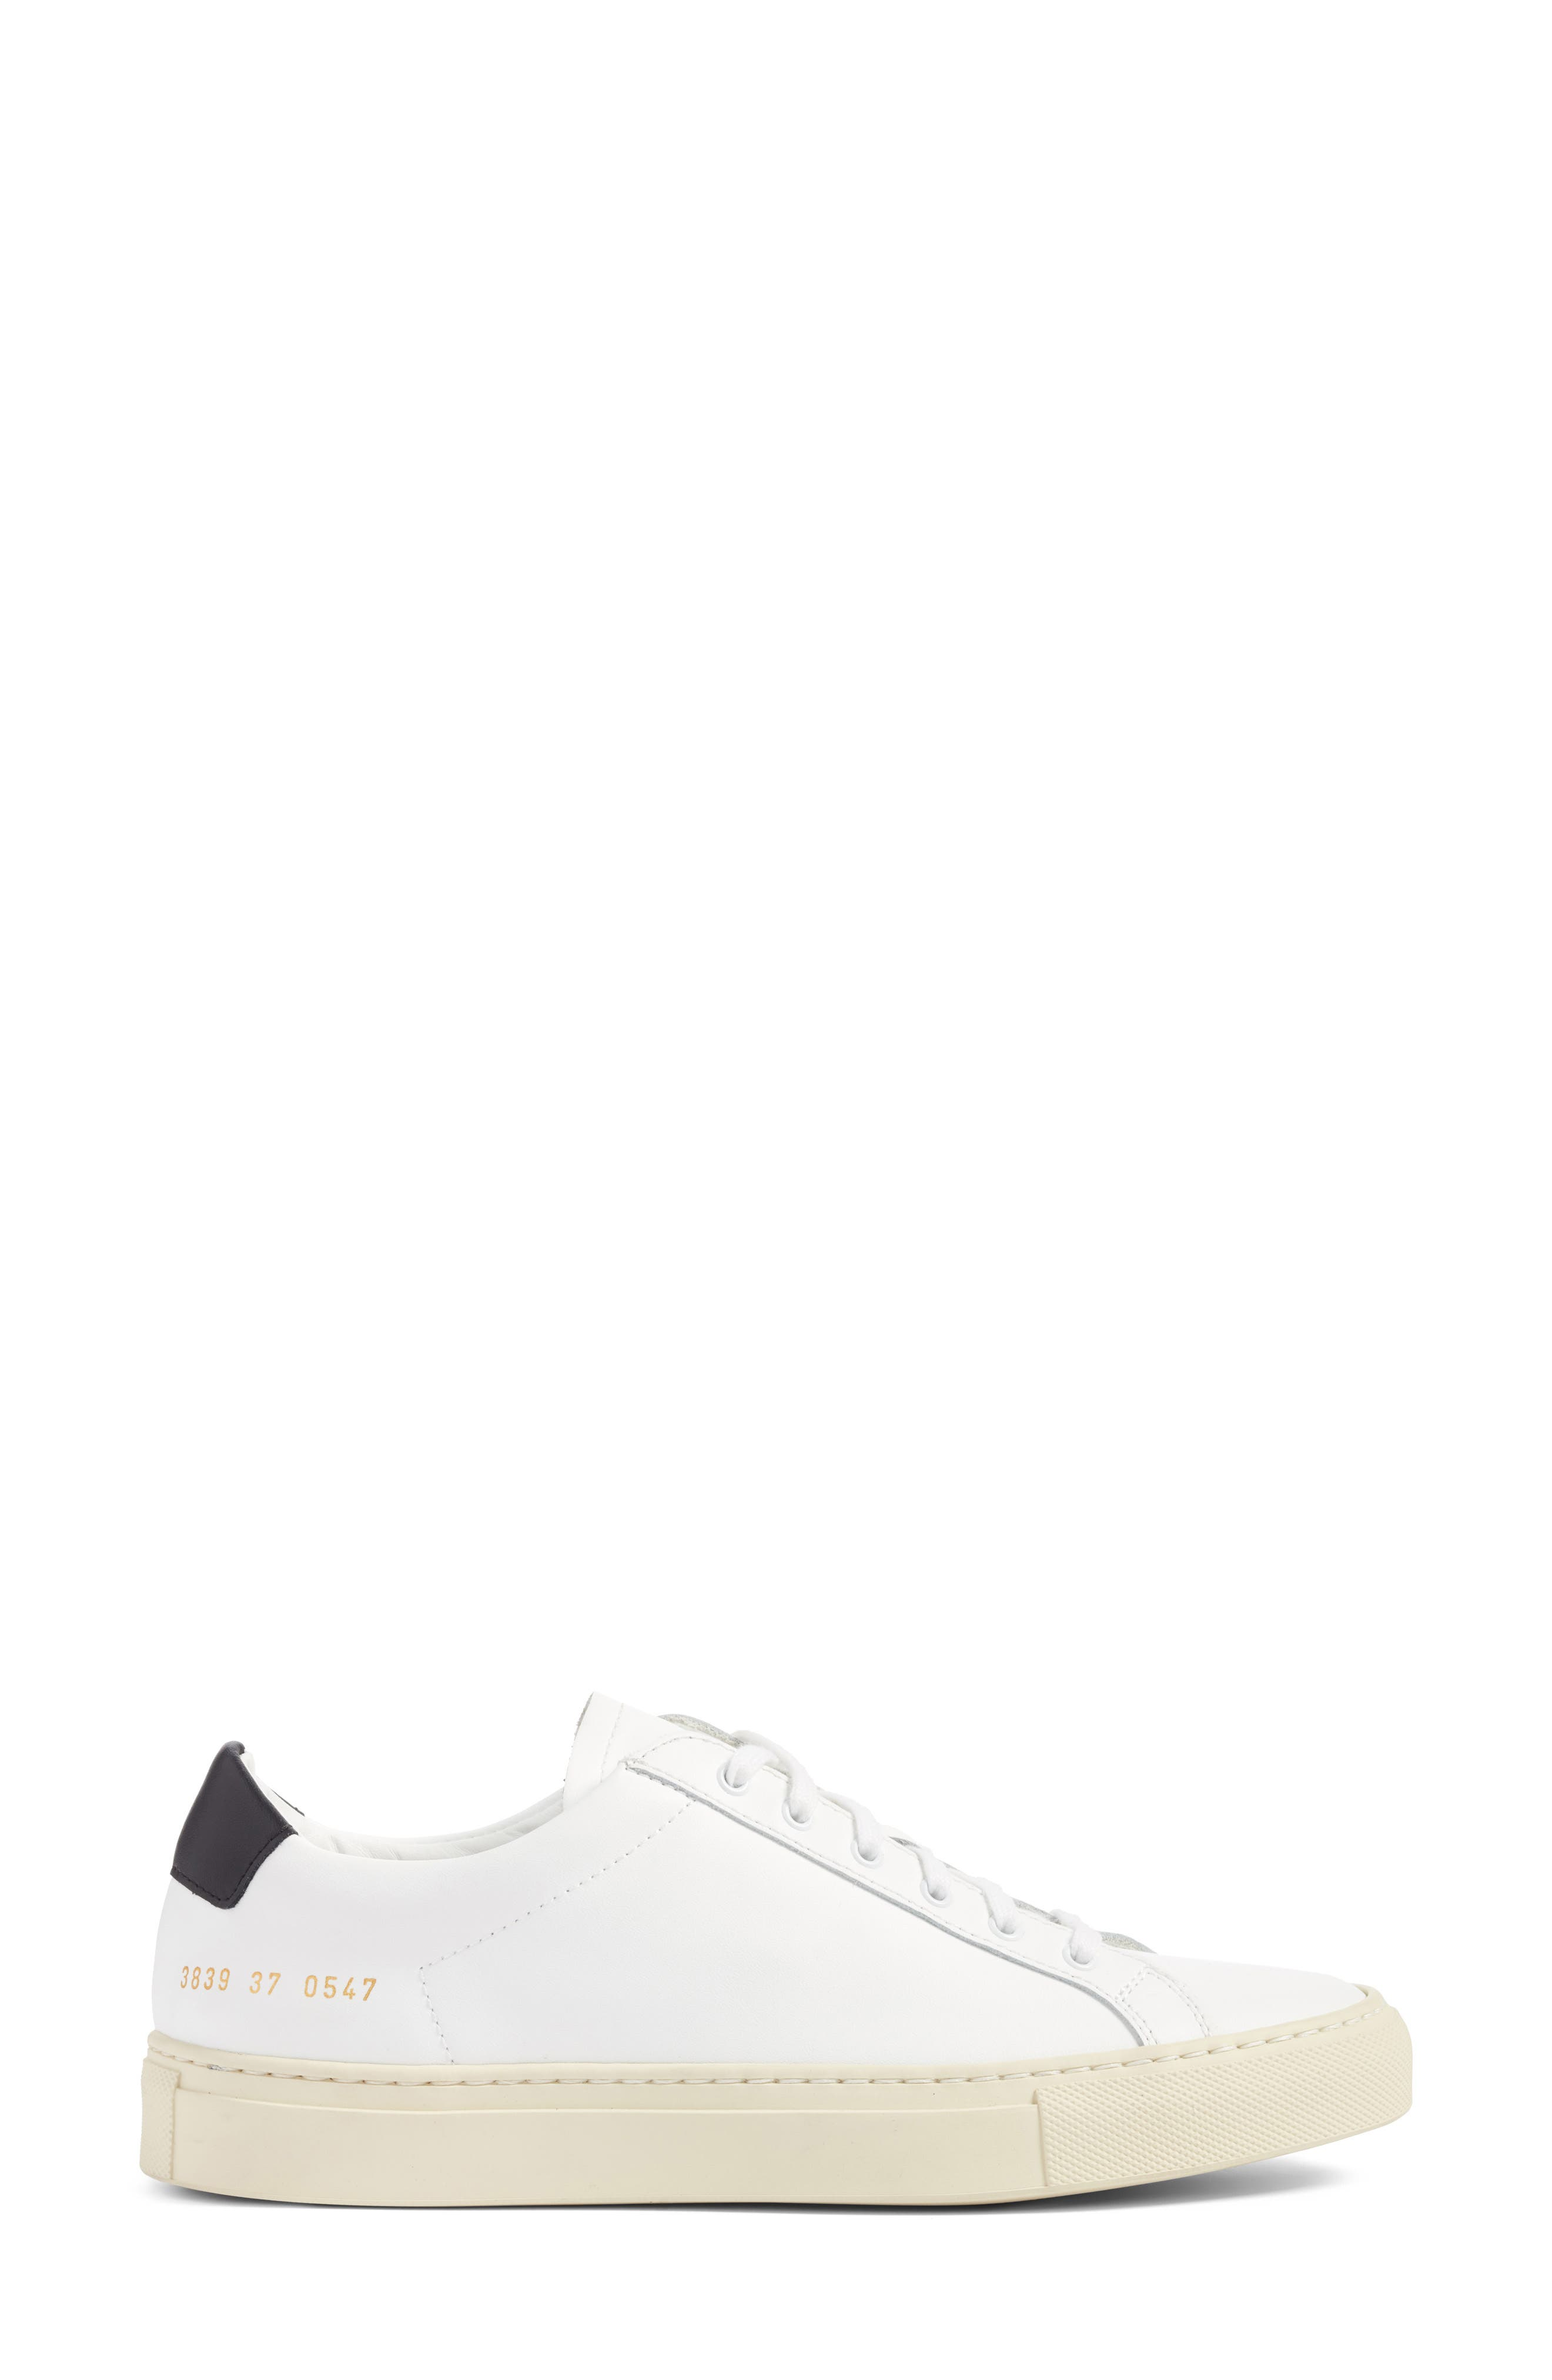 Achilles Low Top Sneaker,                             Alternate thumbnail 3, color,                             White/ Black